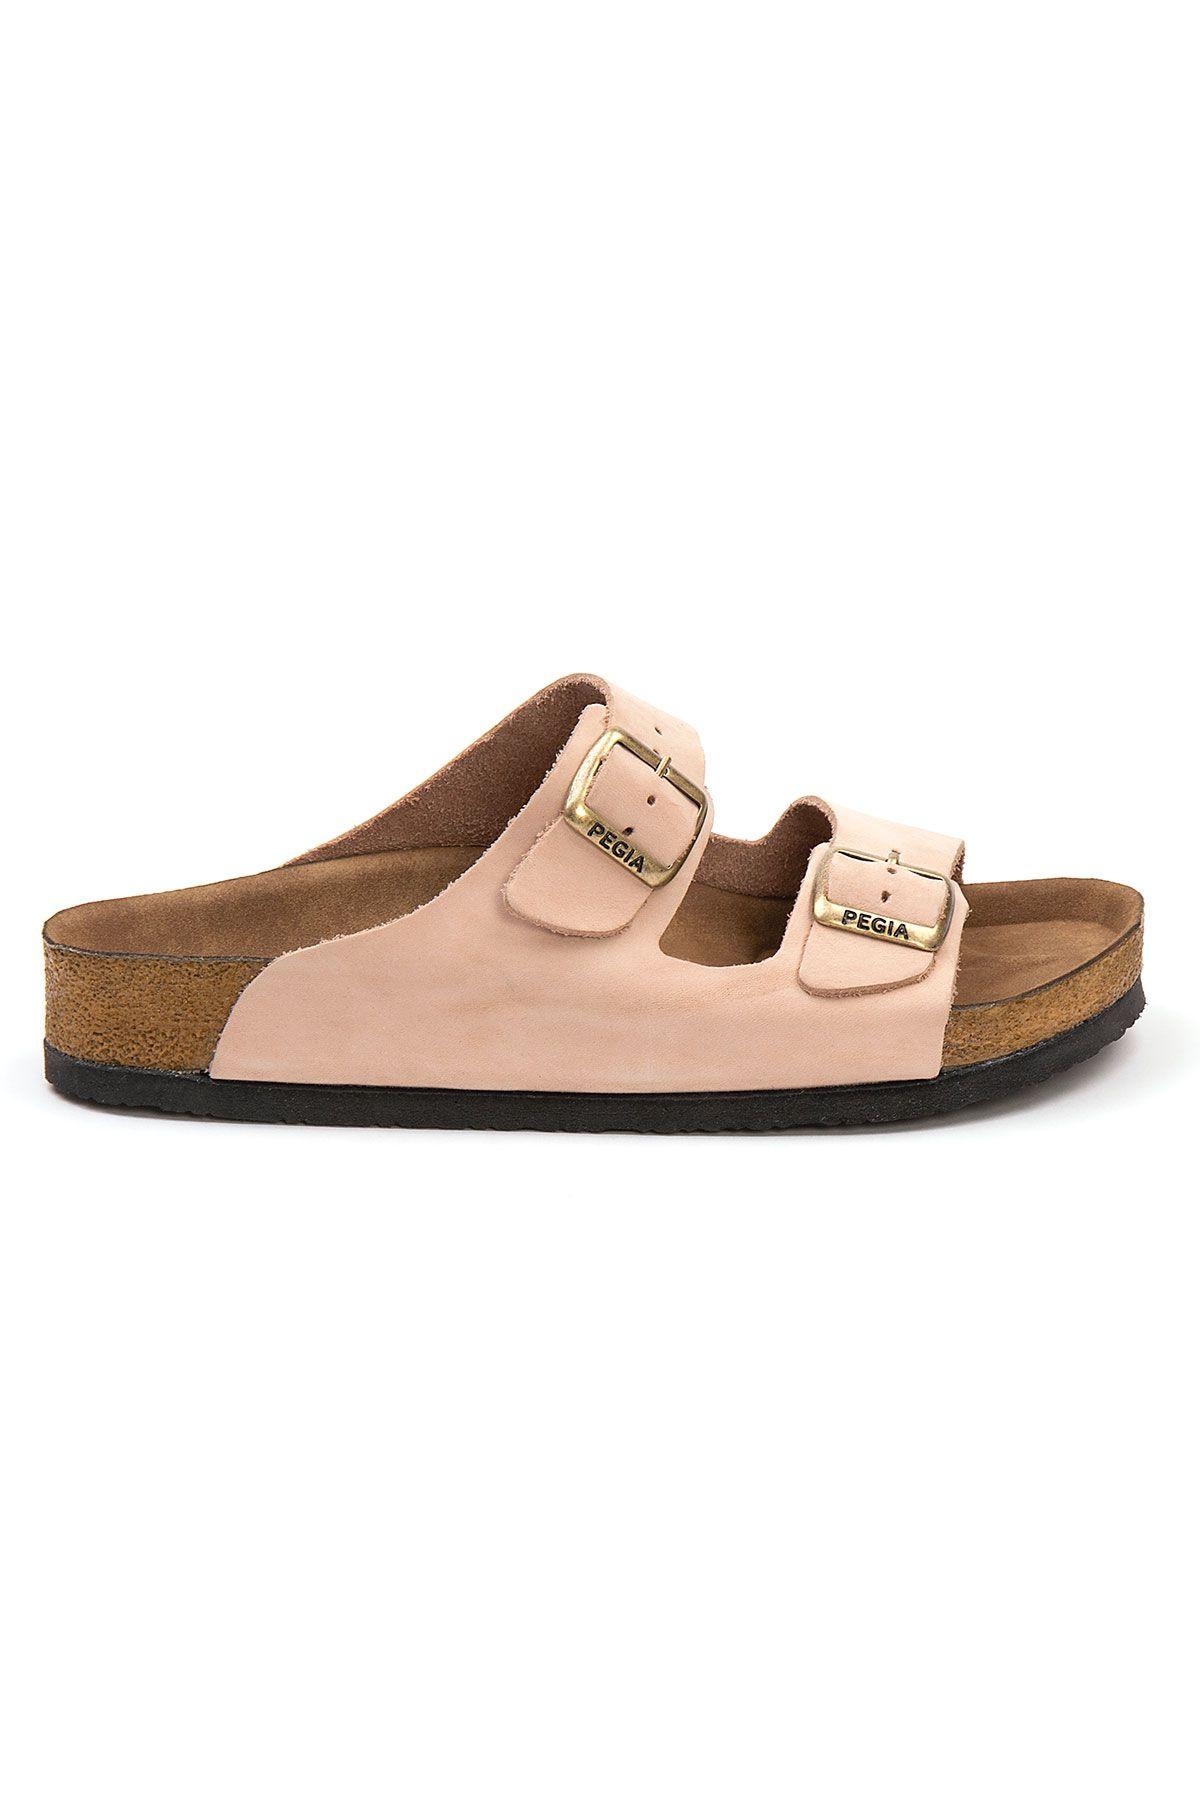 Pegia Women's Leather Strap Slippers 215520 Powdery